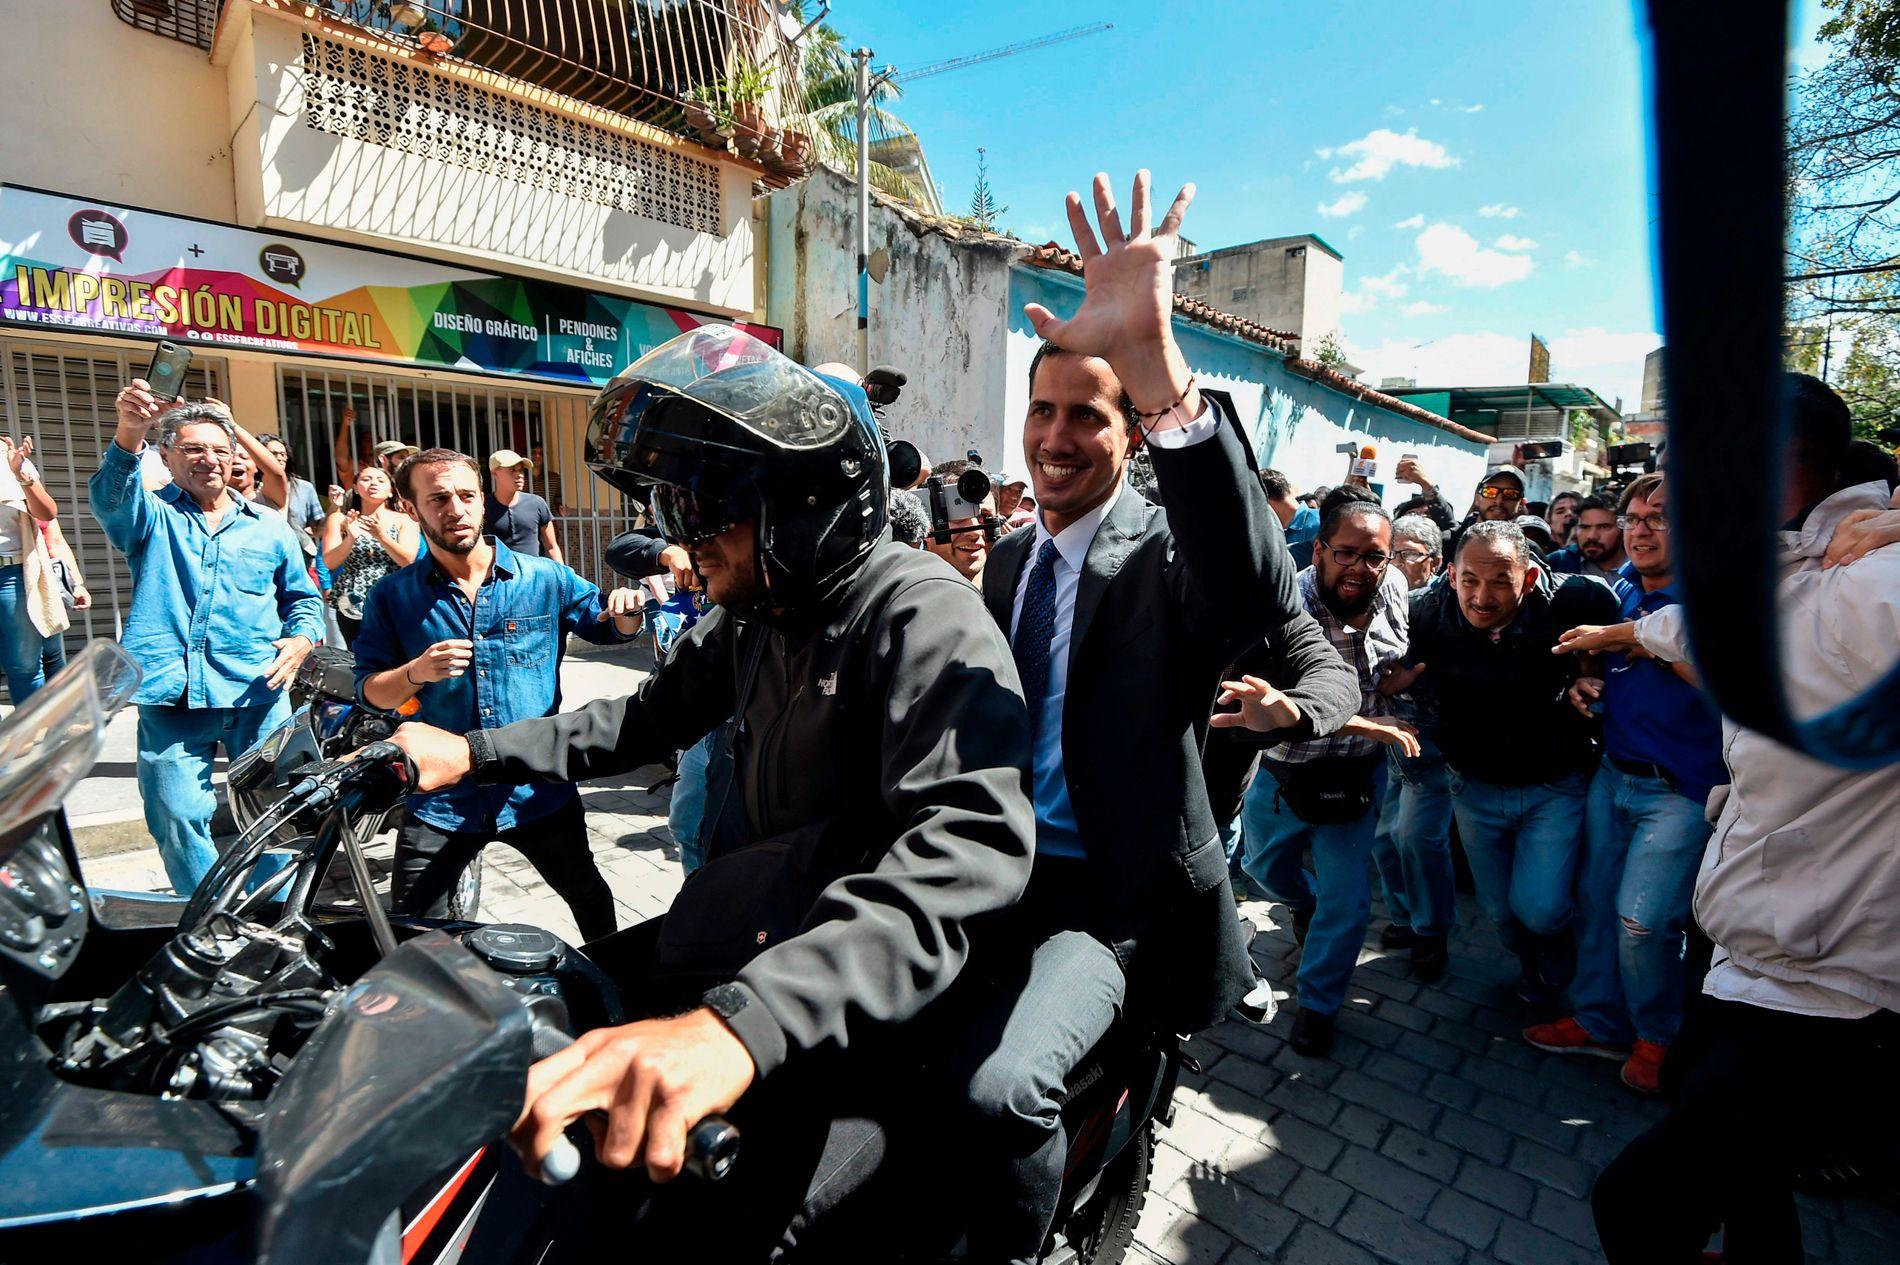 NORSKE FORBINDELSER: Opposisjonsleder i Venezuela, Juan Guaidó, sa til sine tilhengere torsdag kveld at det er pågående samtaler i Norge om konflikten i landet.